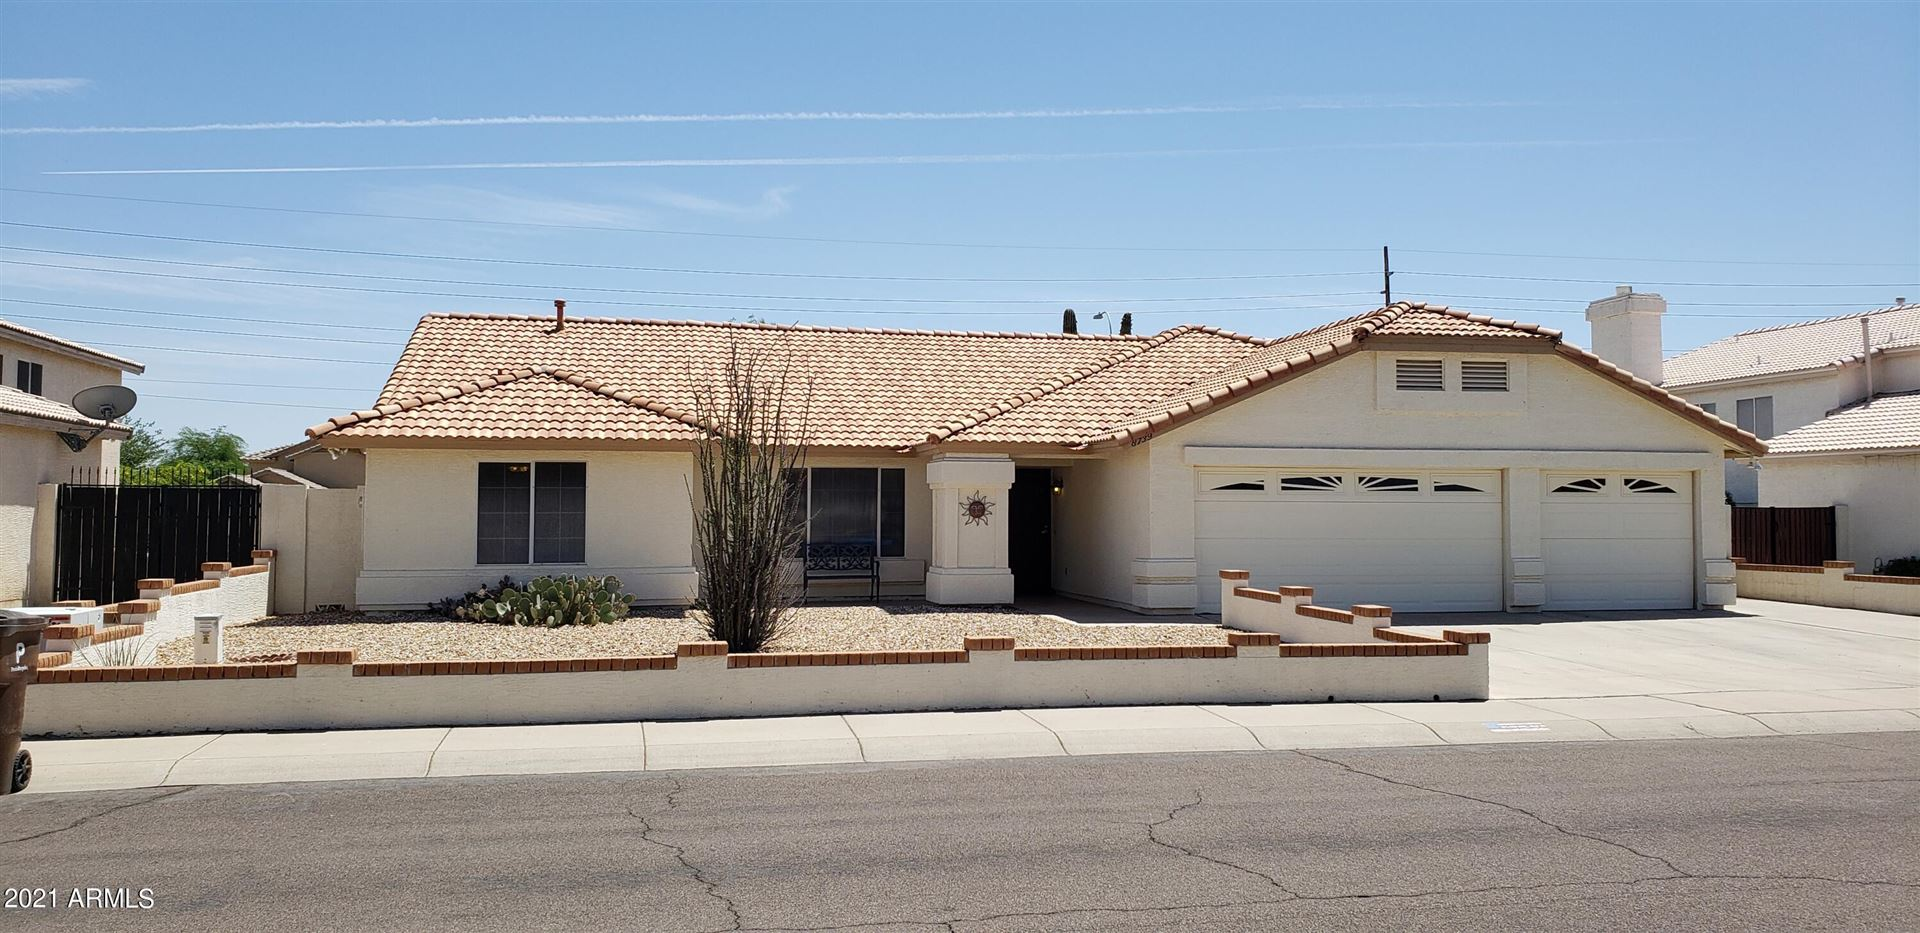 Photo of 8739 W WETHERSFIELD Road, Peoria, AZ 85381 (MLS # 6232493)